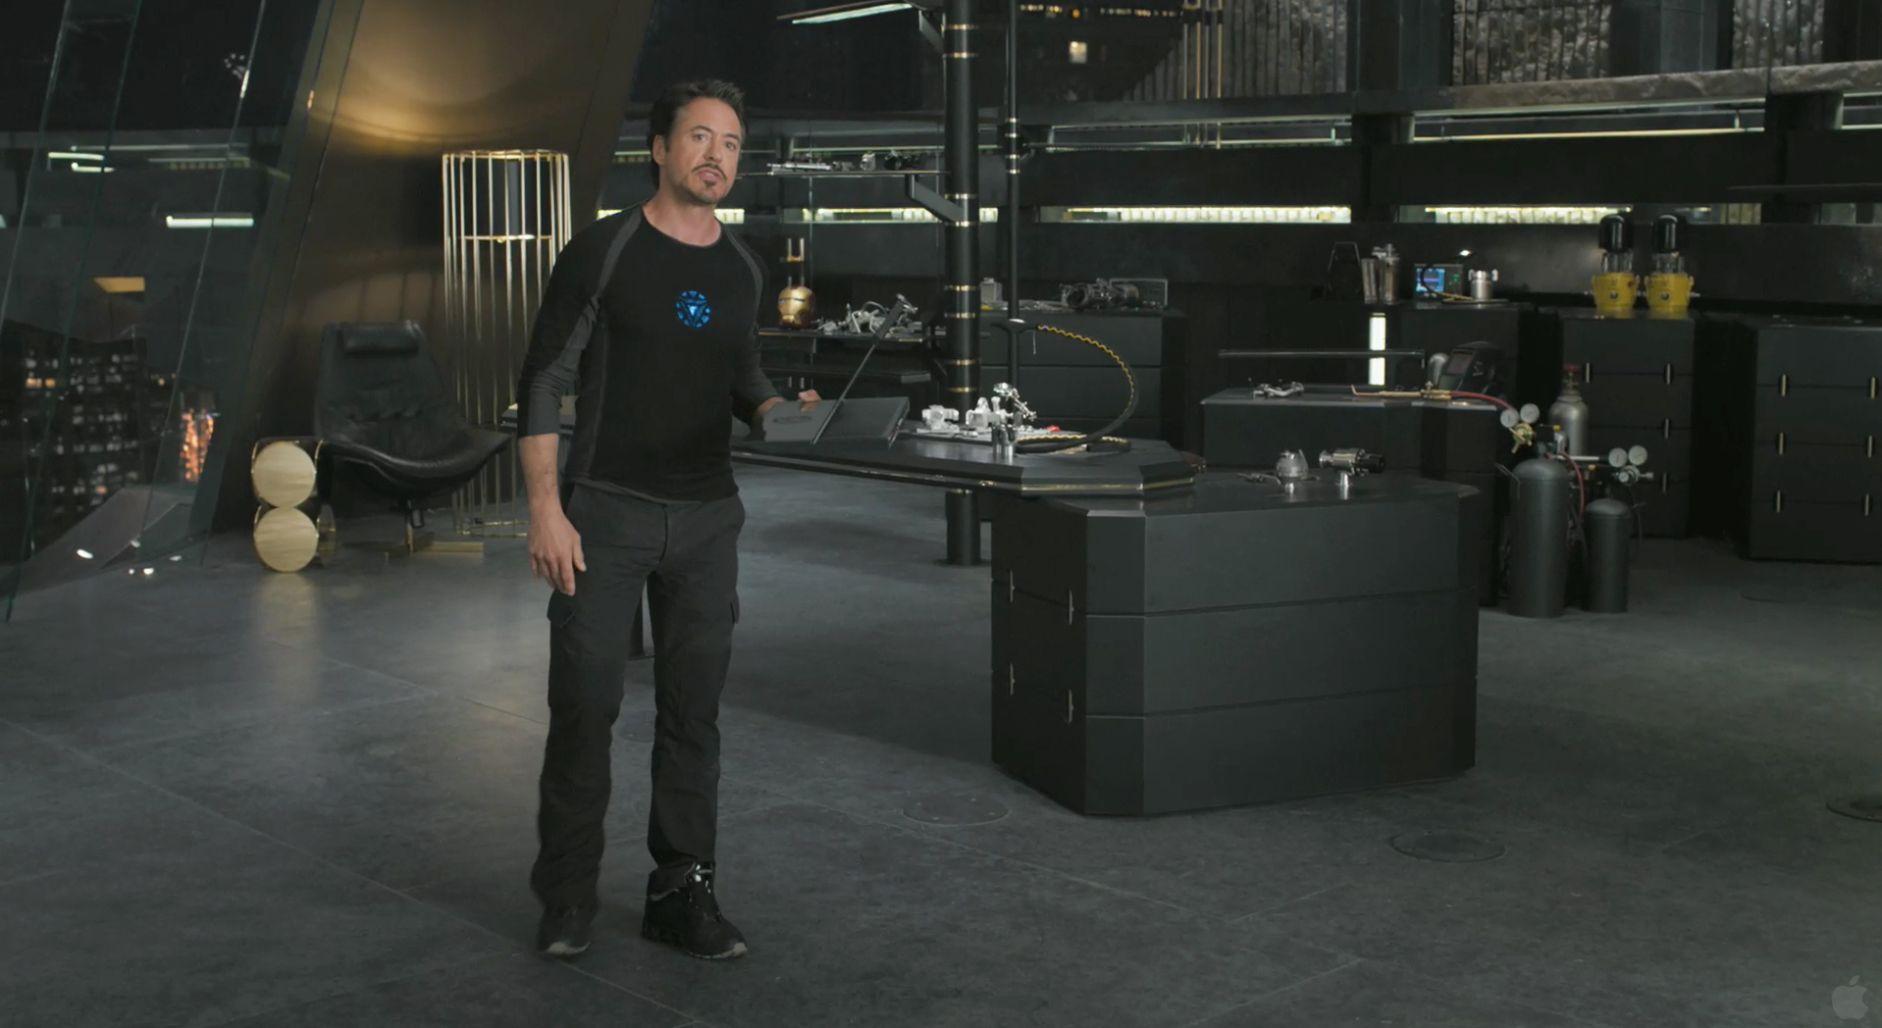 iron man office. Http://bestmoviesevernews.com/wp-content/uploads/2012/. Tony StarkThe AvengersTowersArc ReactorMan OfficeIron Iron Man Office